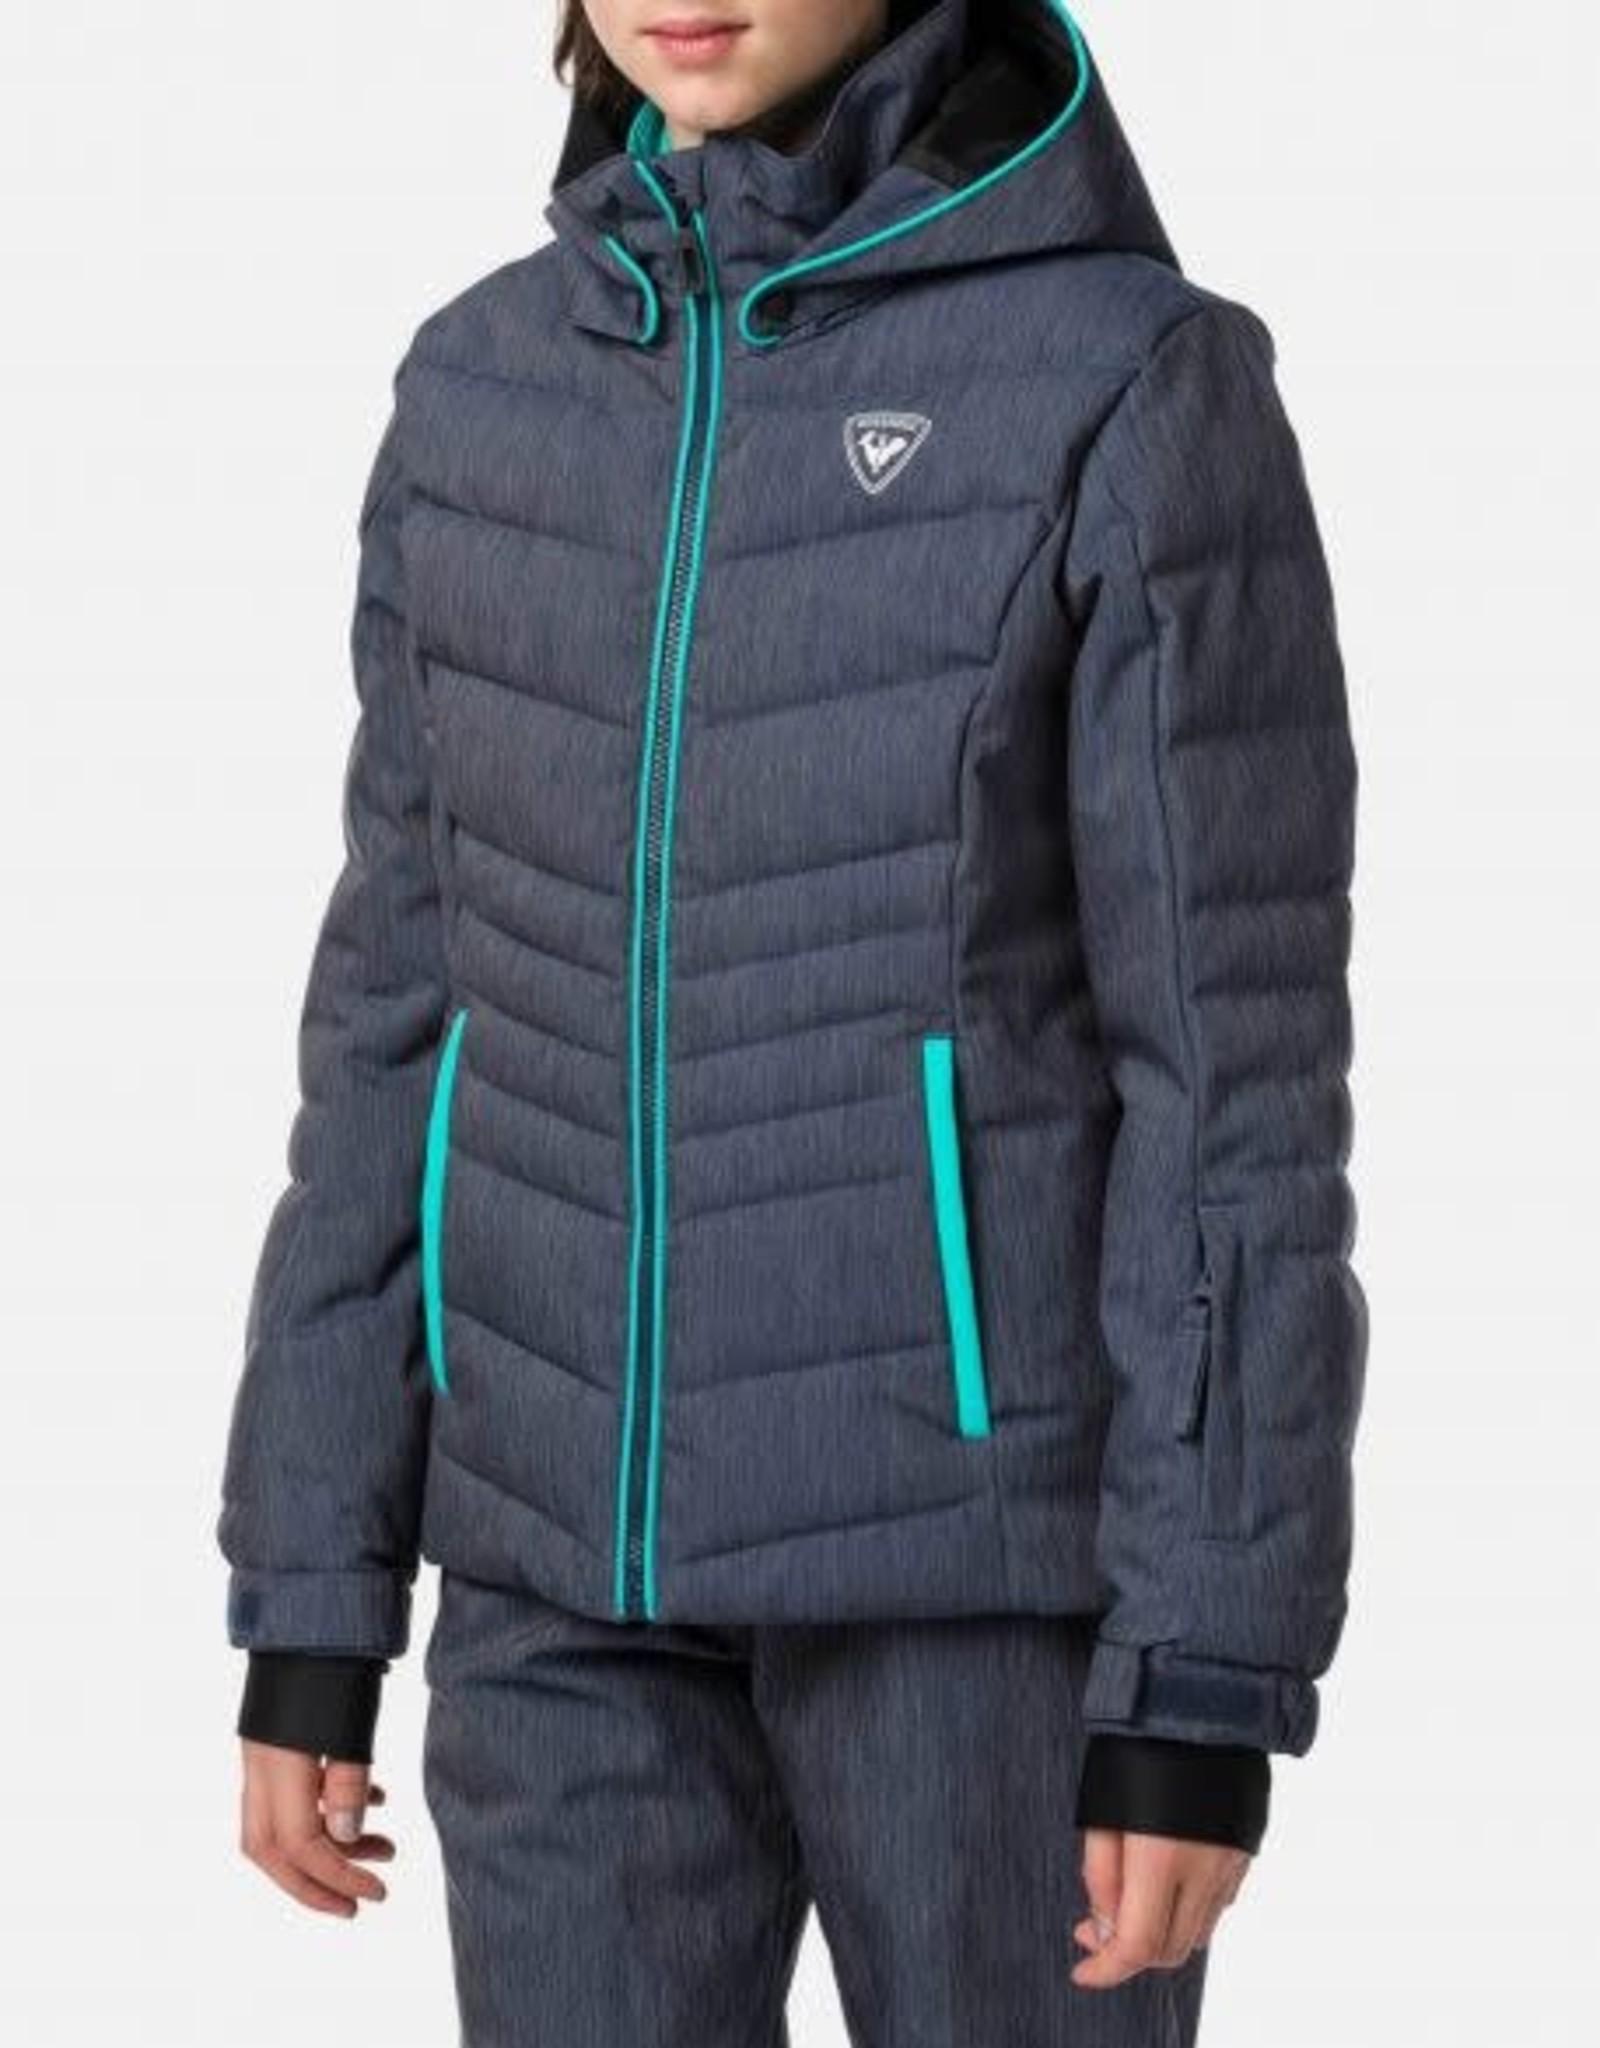 ROSSIGNOL Rossignol Girl's Polydown PR Ski Jacket